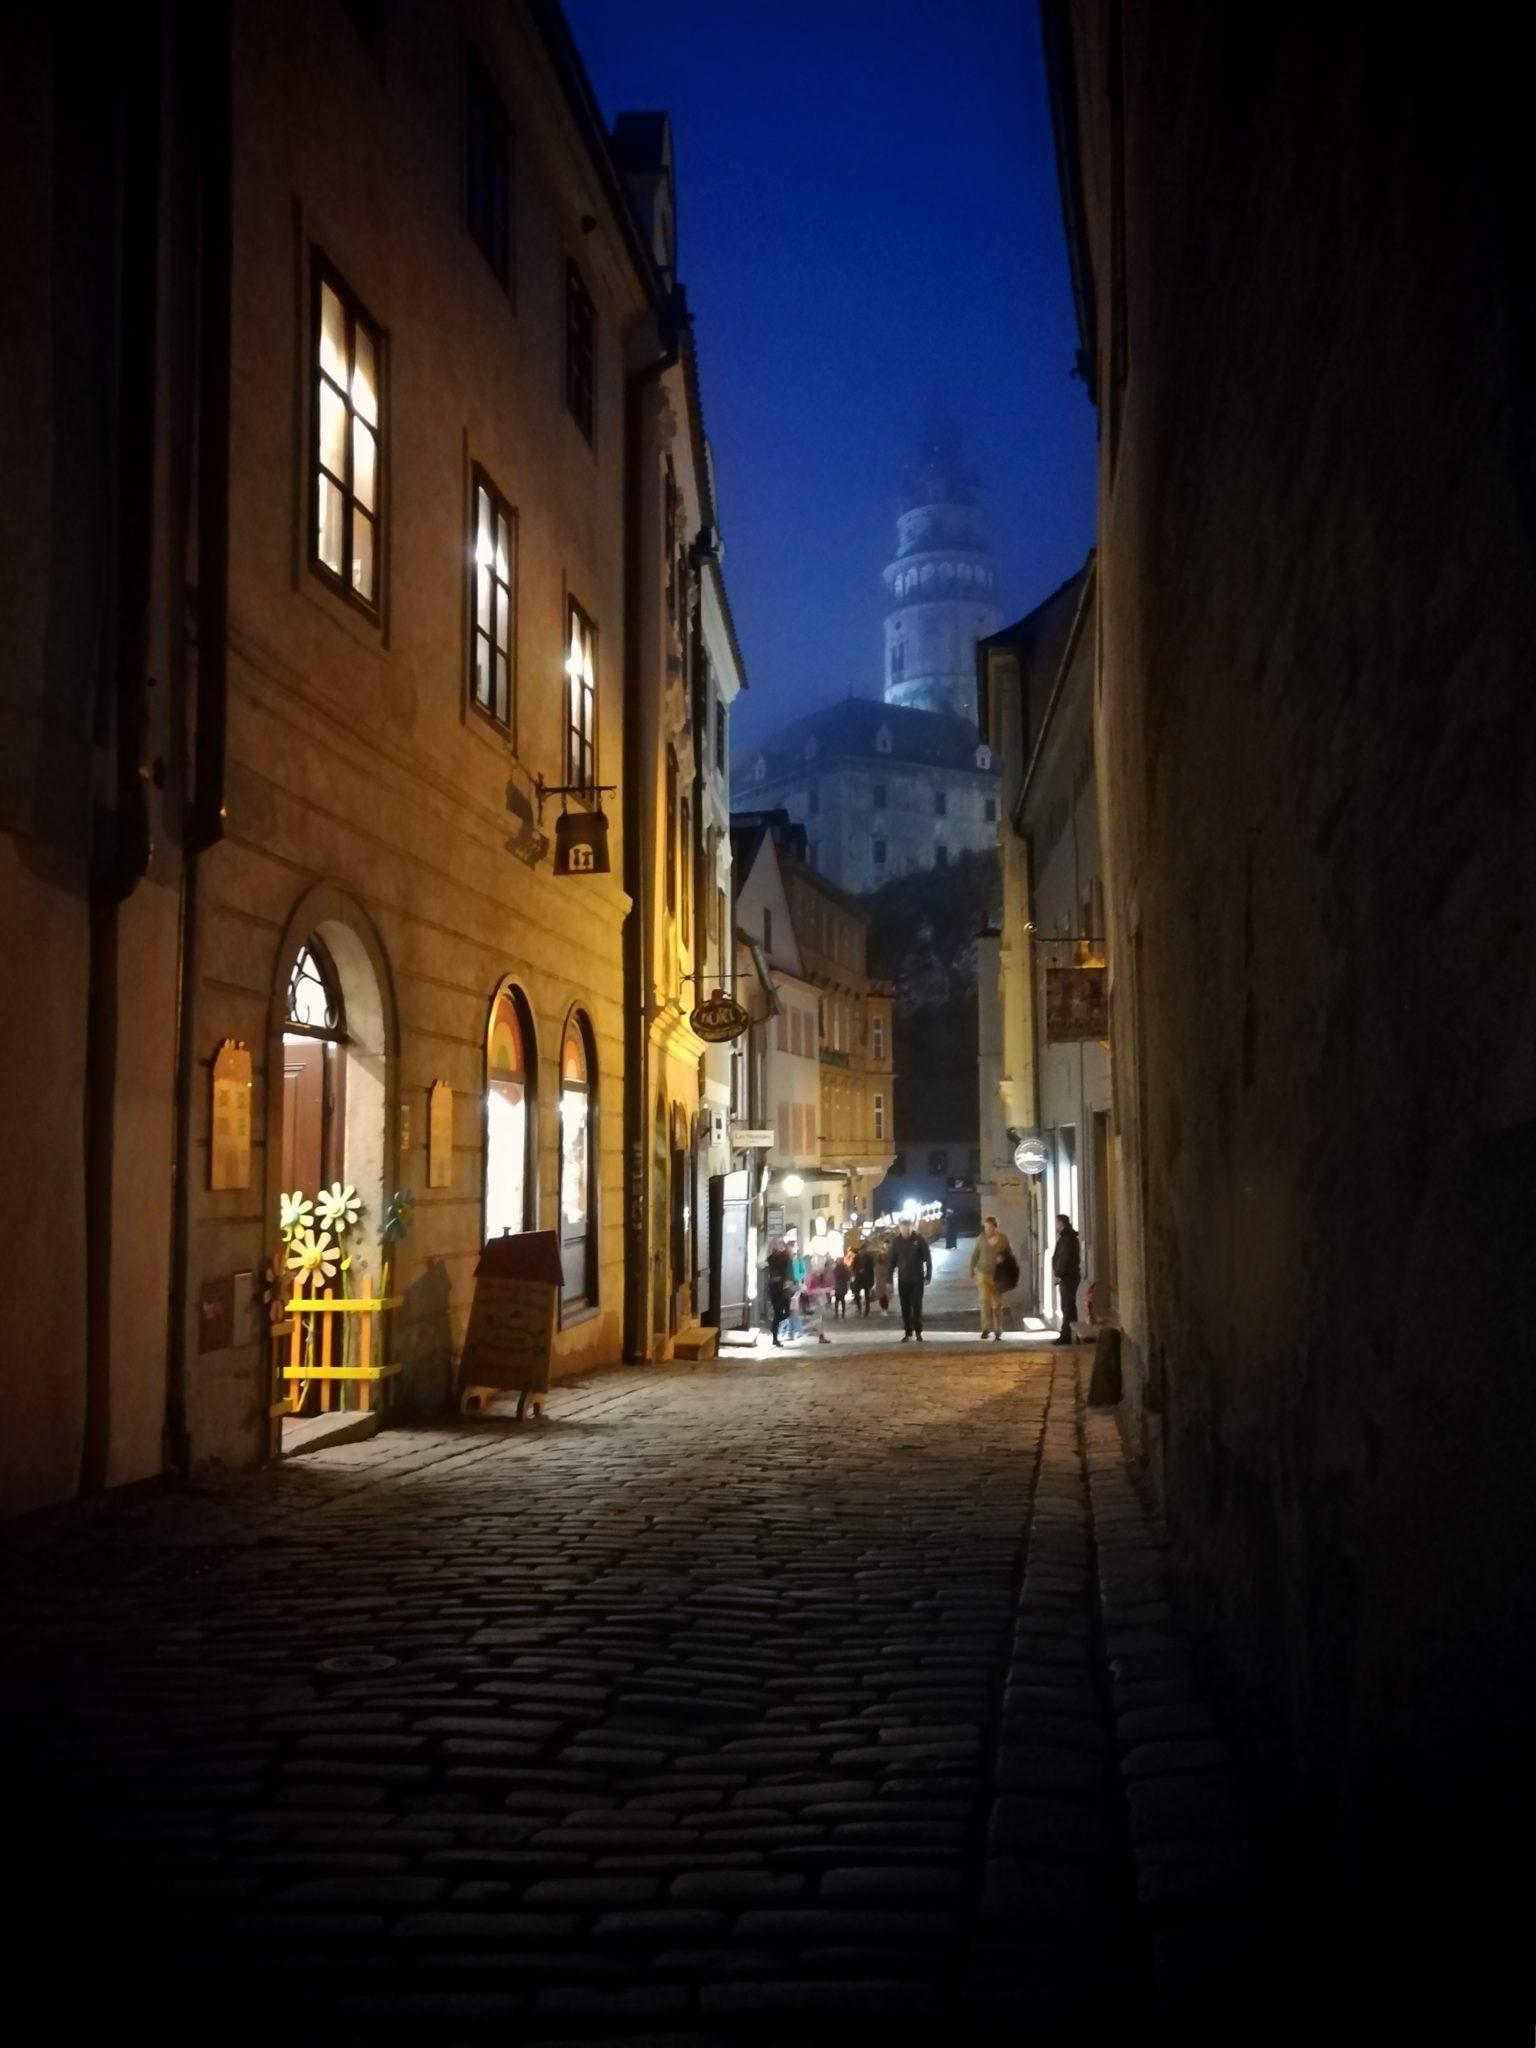 Radniční ulice Český Krumlov